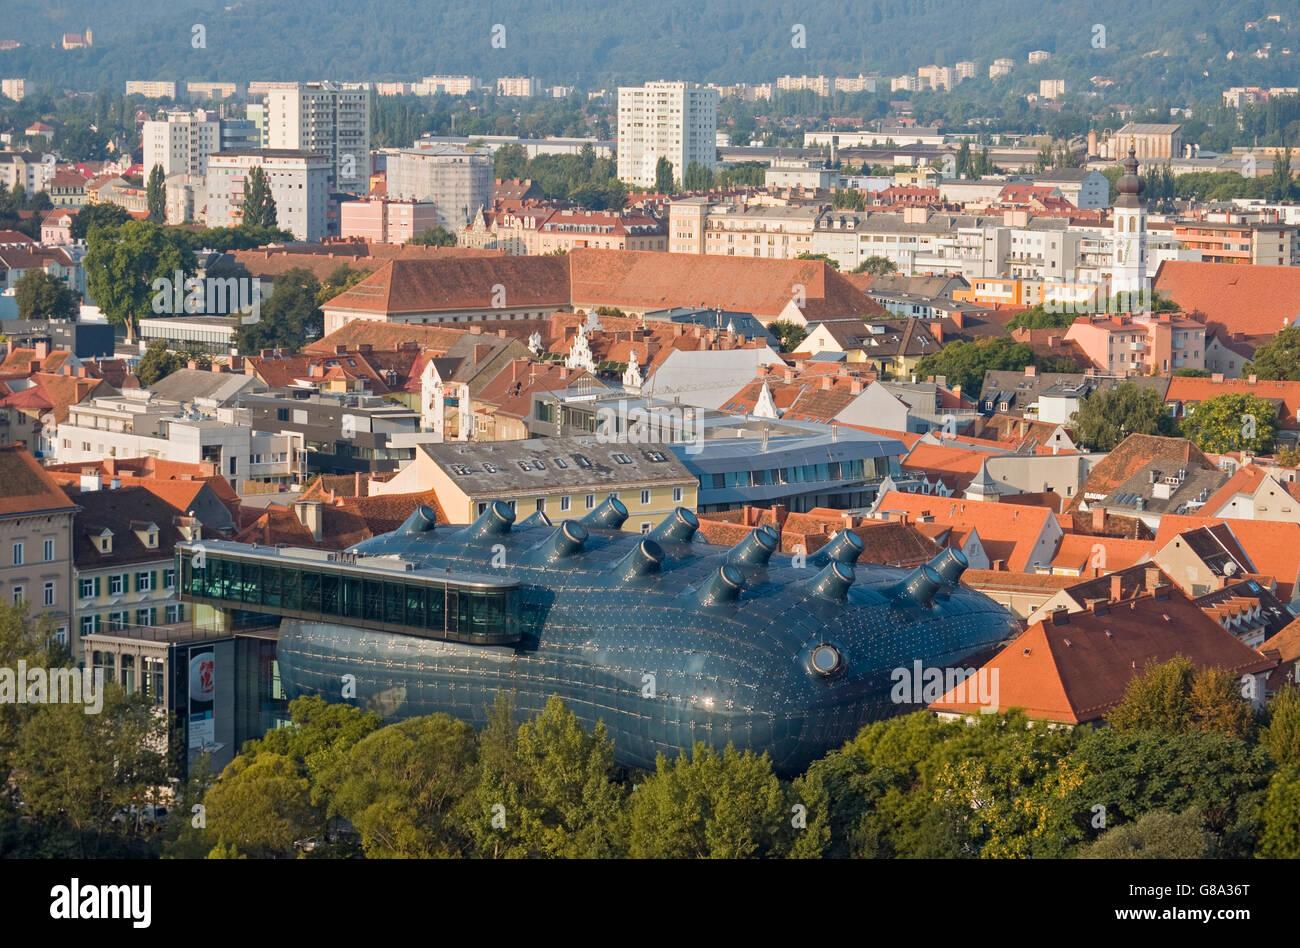 Overlooking Graz from Schlossberg hill, with Grazer Kunsthaus art museum in front, Graz, Styria, Austria, Europe Stock Photo